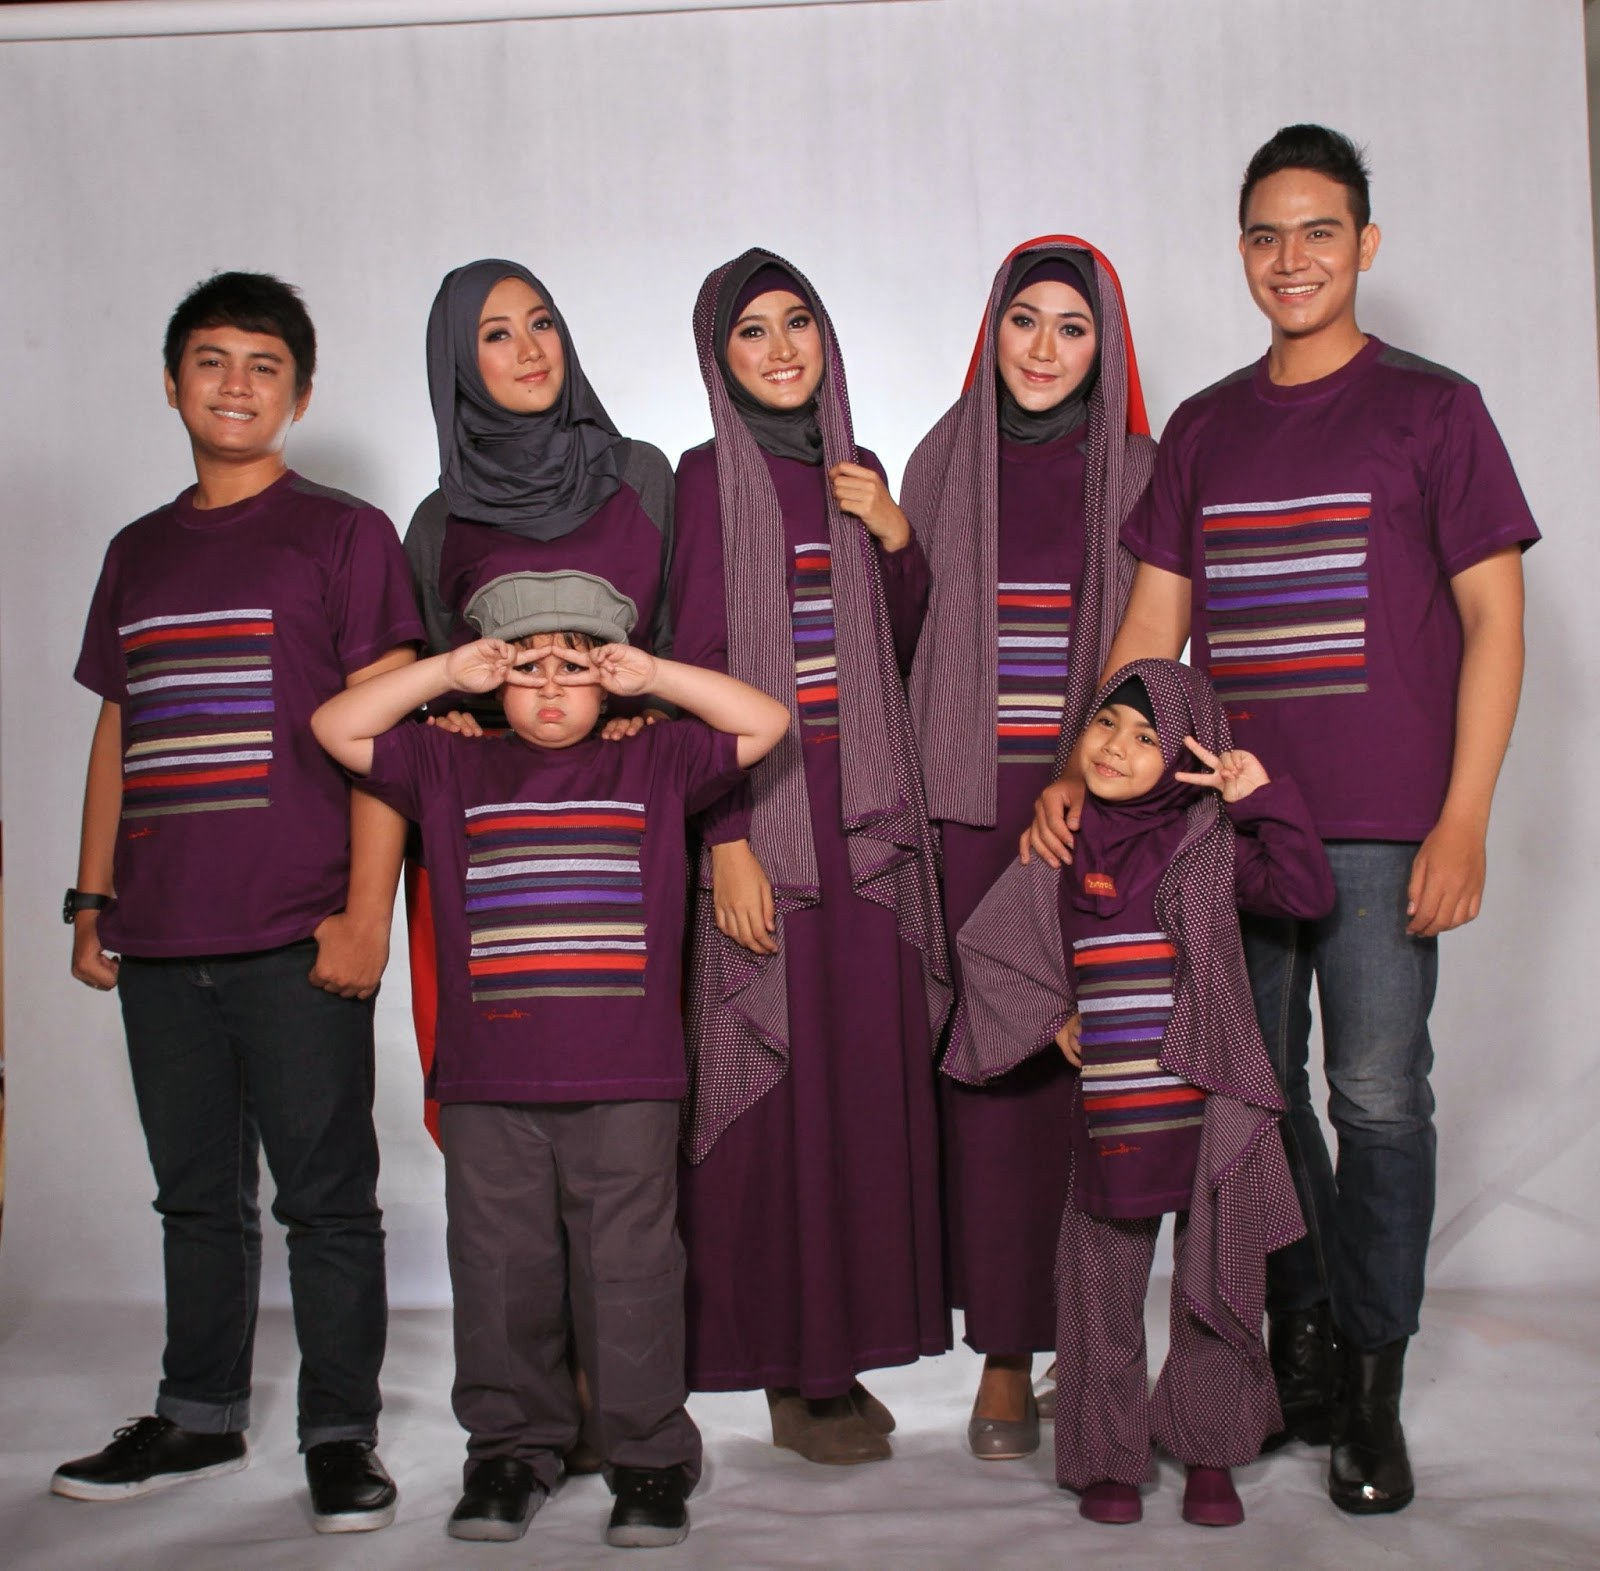 Inspirasi Model Baju Lebaran Anak Perempuan 2018 0gdr Model Baju Keluarga Untuk Hari Raya Lebaran 2018